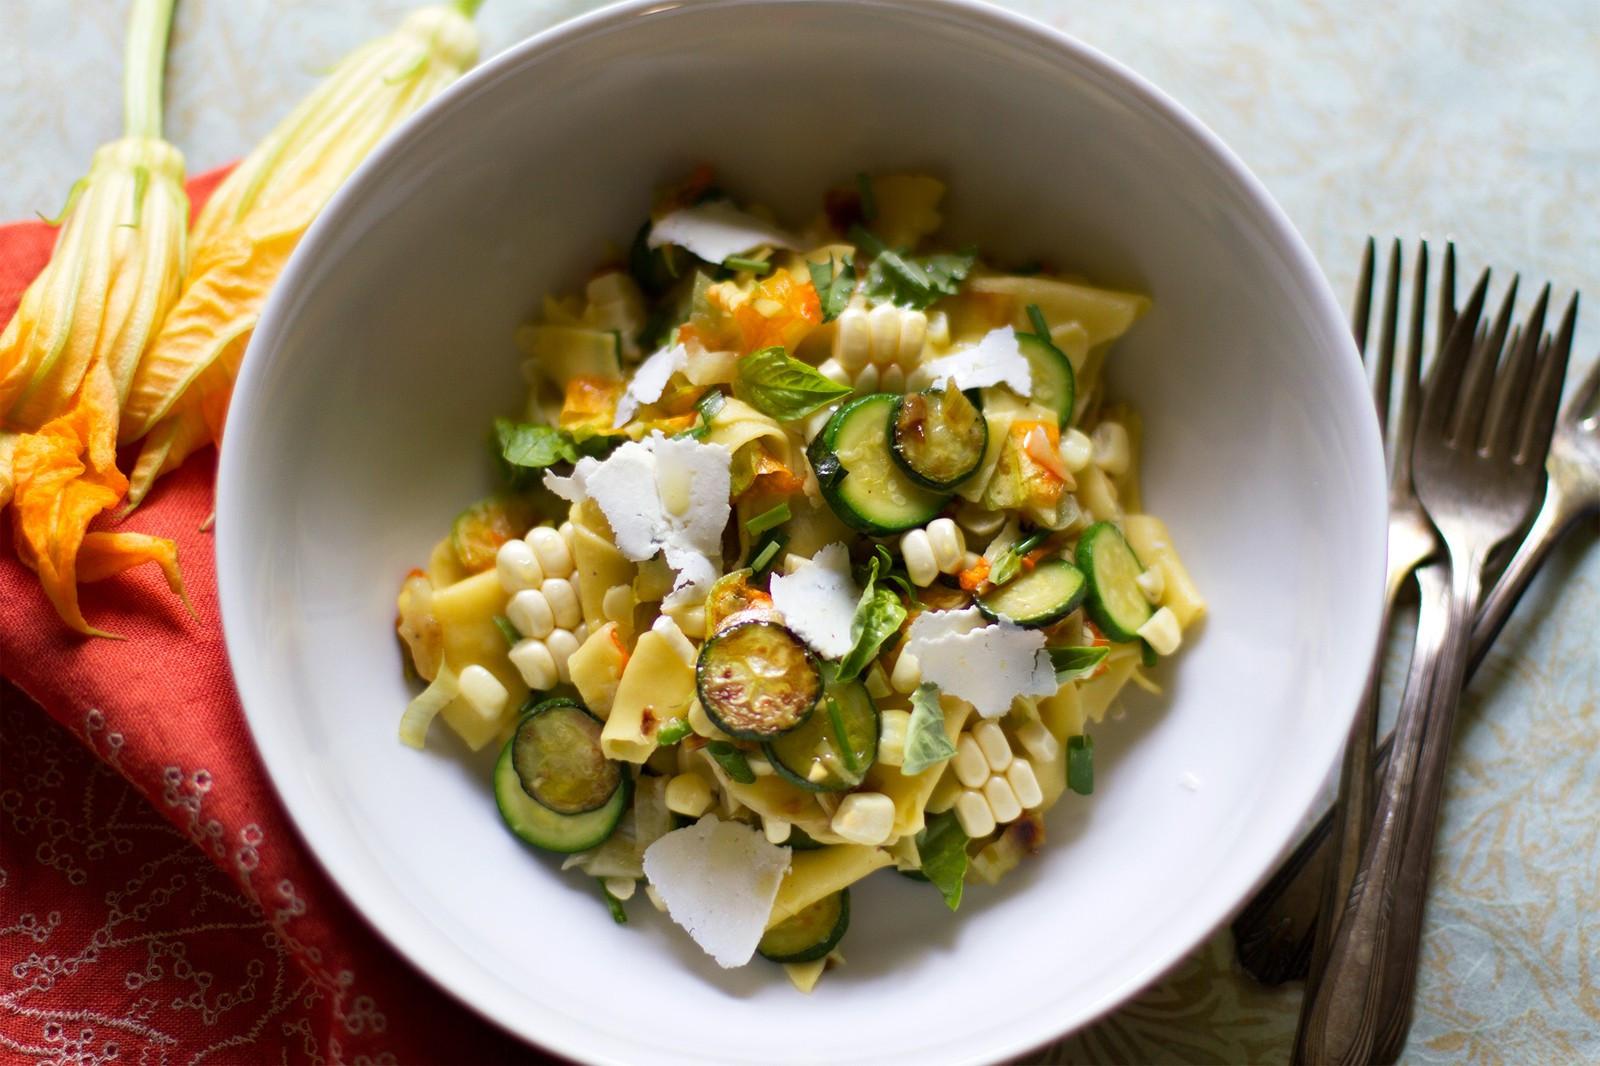 Vegetarian Summer Recipes  Maltagliati Pasta with Summer Ve ables and Ricotta Salata